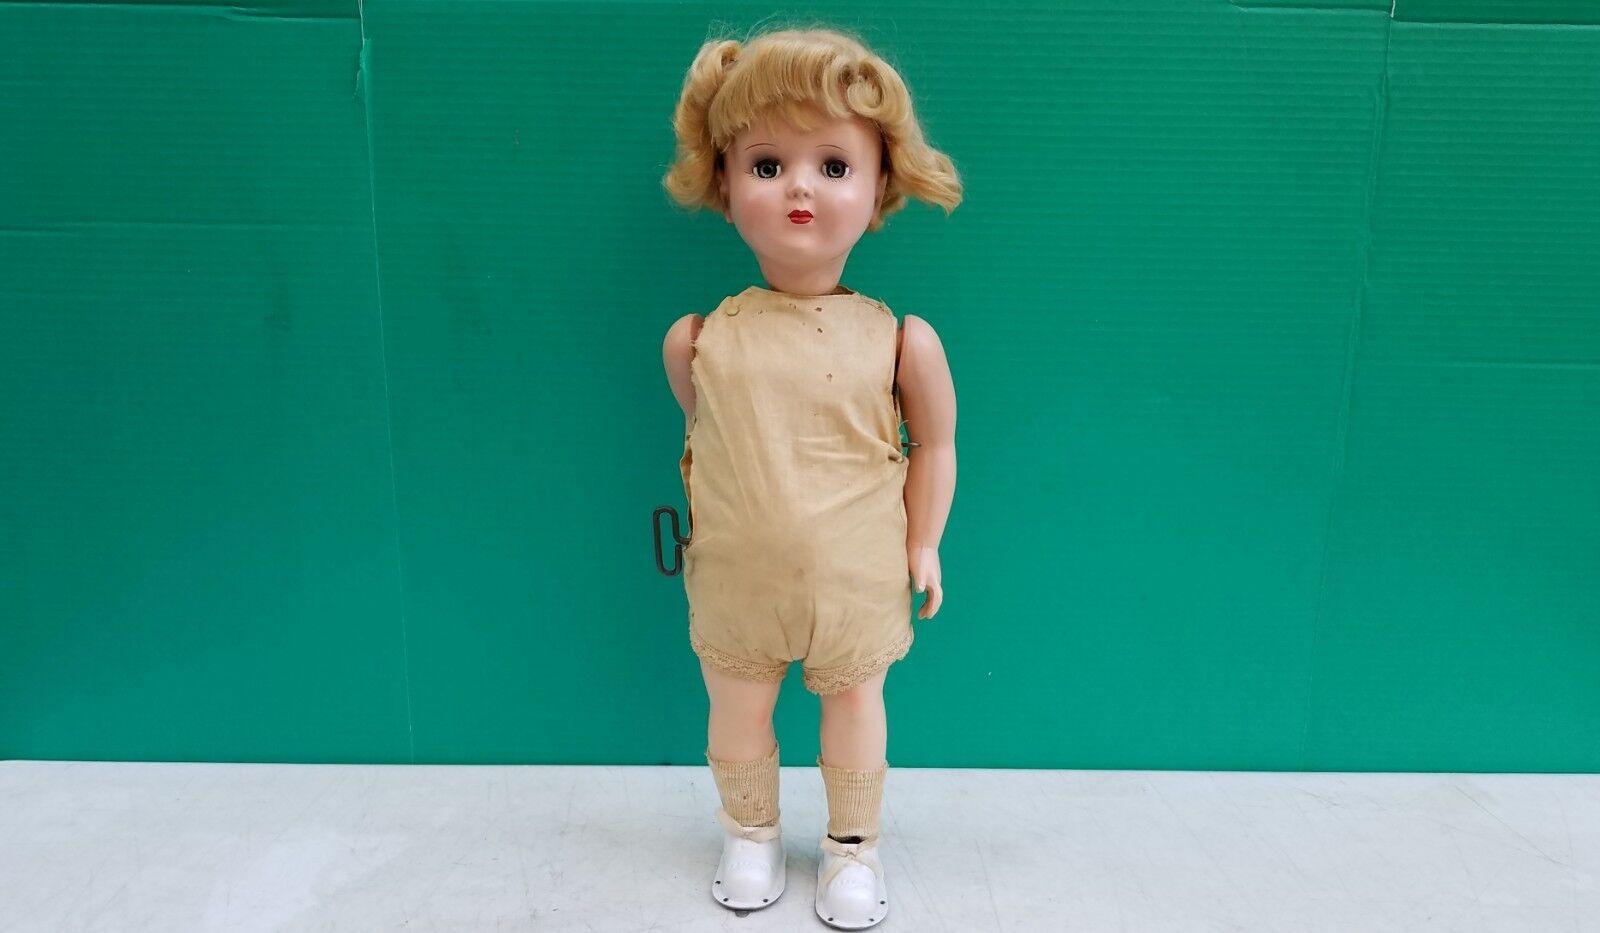 Wanda Wanda Wanda The Walking Doll Advance Doll Toy Corp - Wind up Hard Plastic doll 1950s 4a06b8